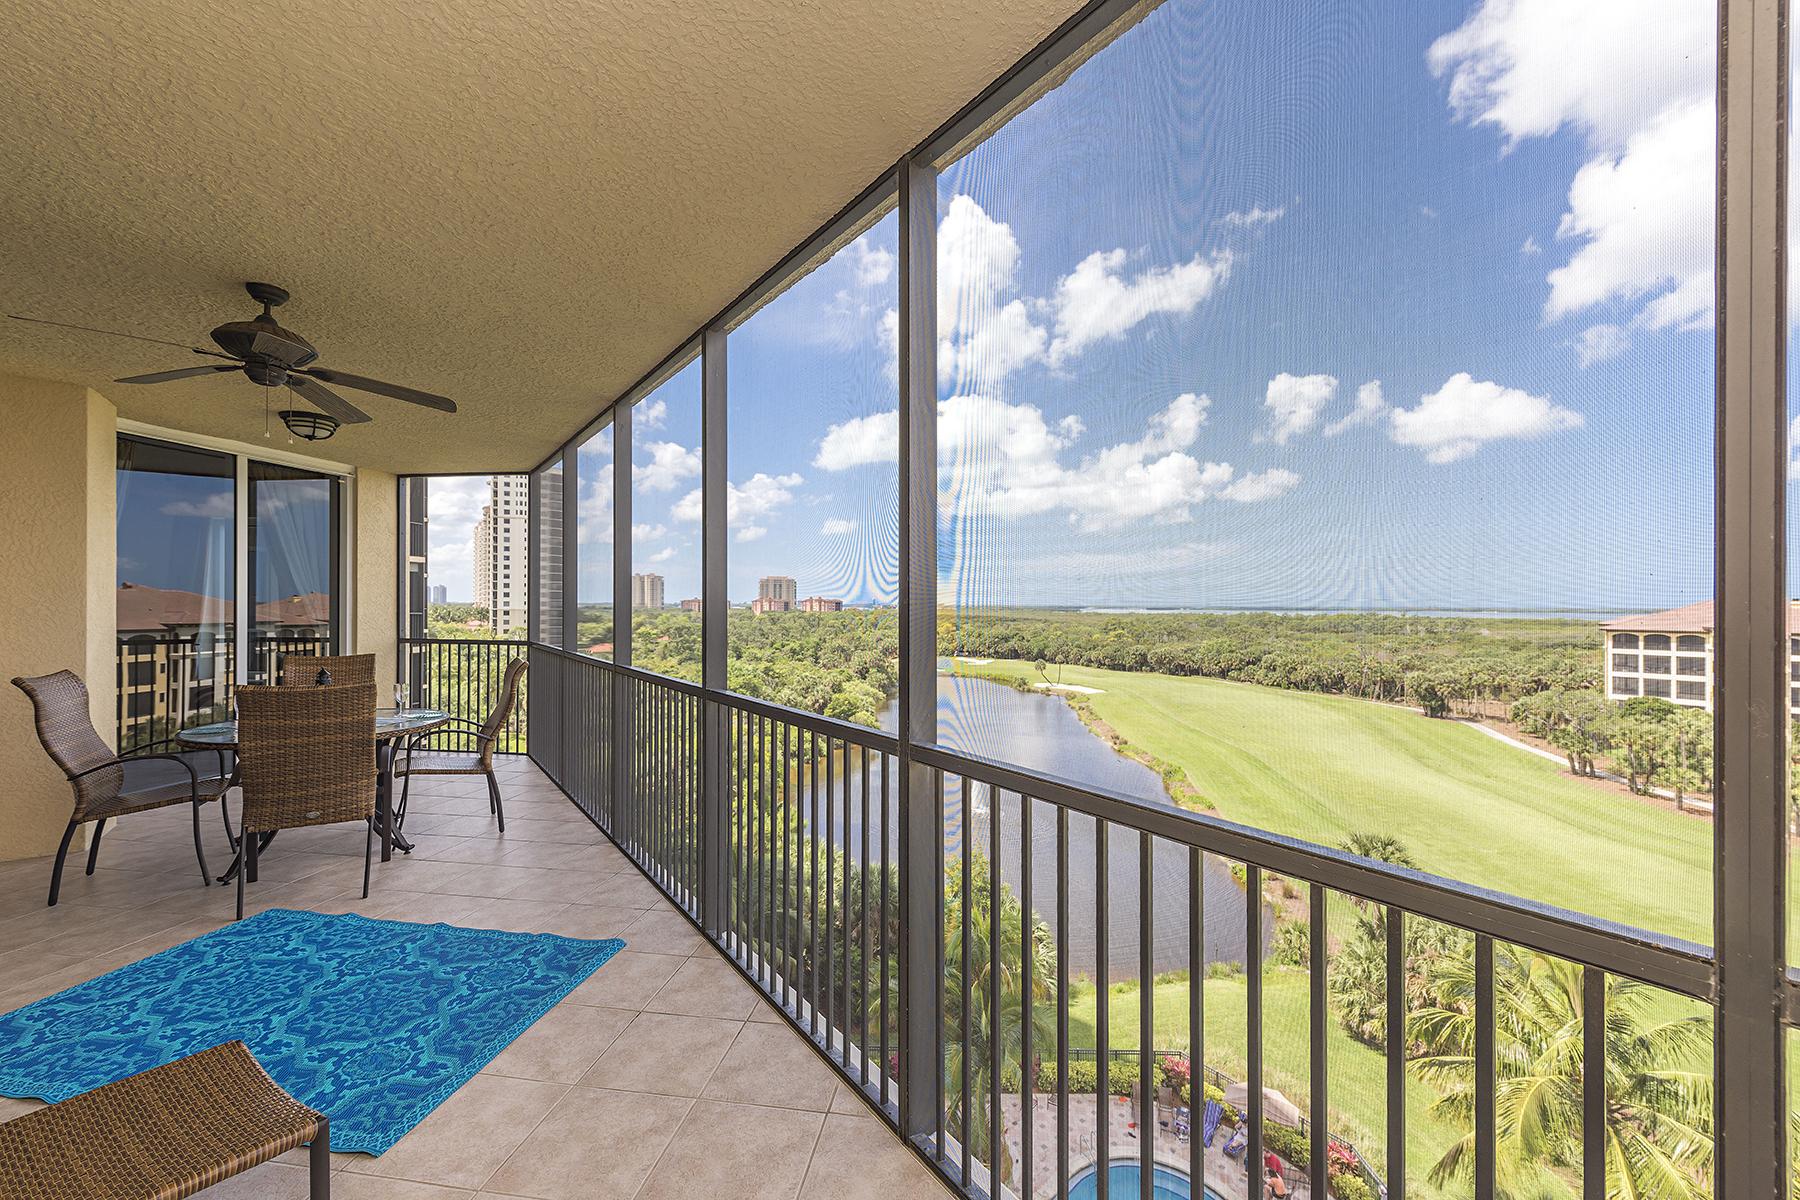 Condomínio para Venda às THE COLONY - PELICAN LANDING - NAVONA 23540 Via Veneto Blvd 704 Bonita Springs, Florida, 34134 Estados Unidos